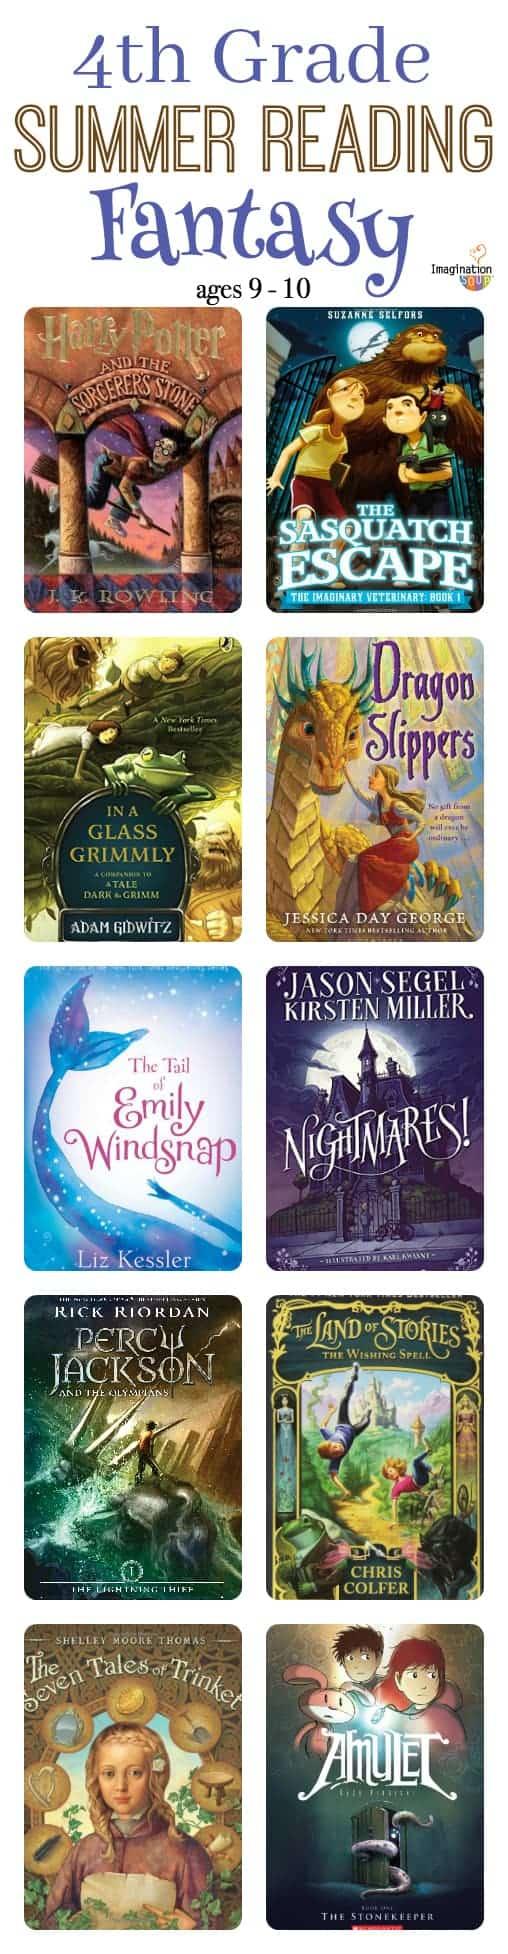 fourth grade summer reading list -- fantasy book choices